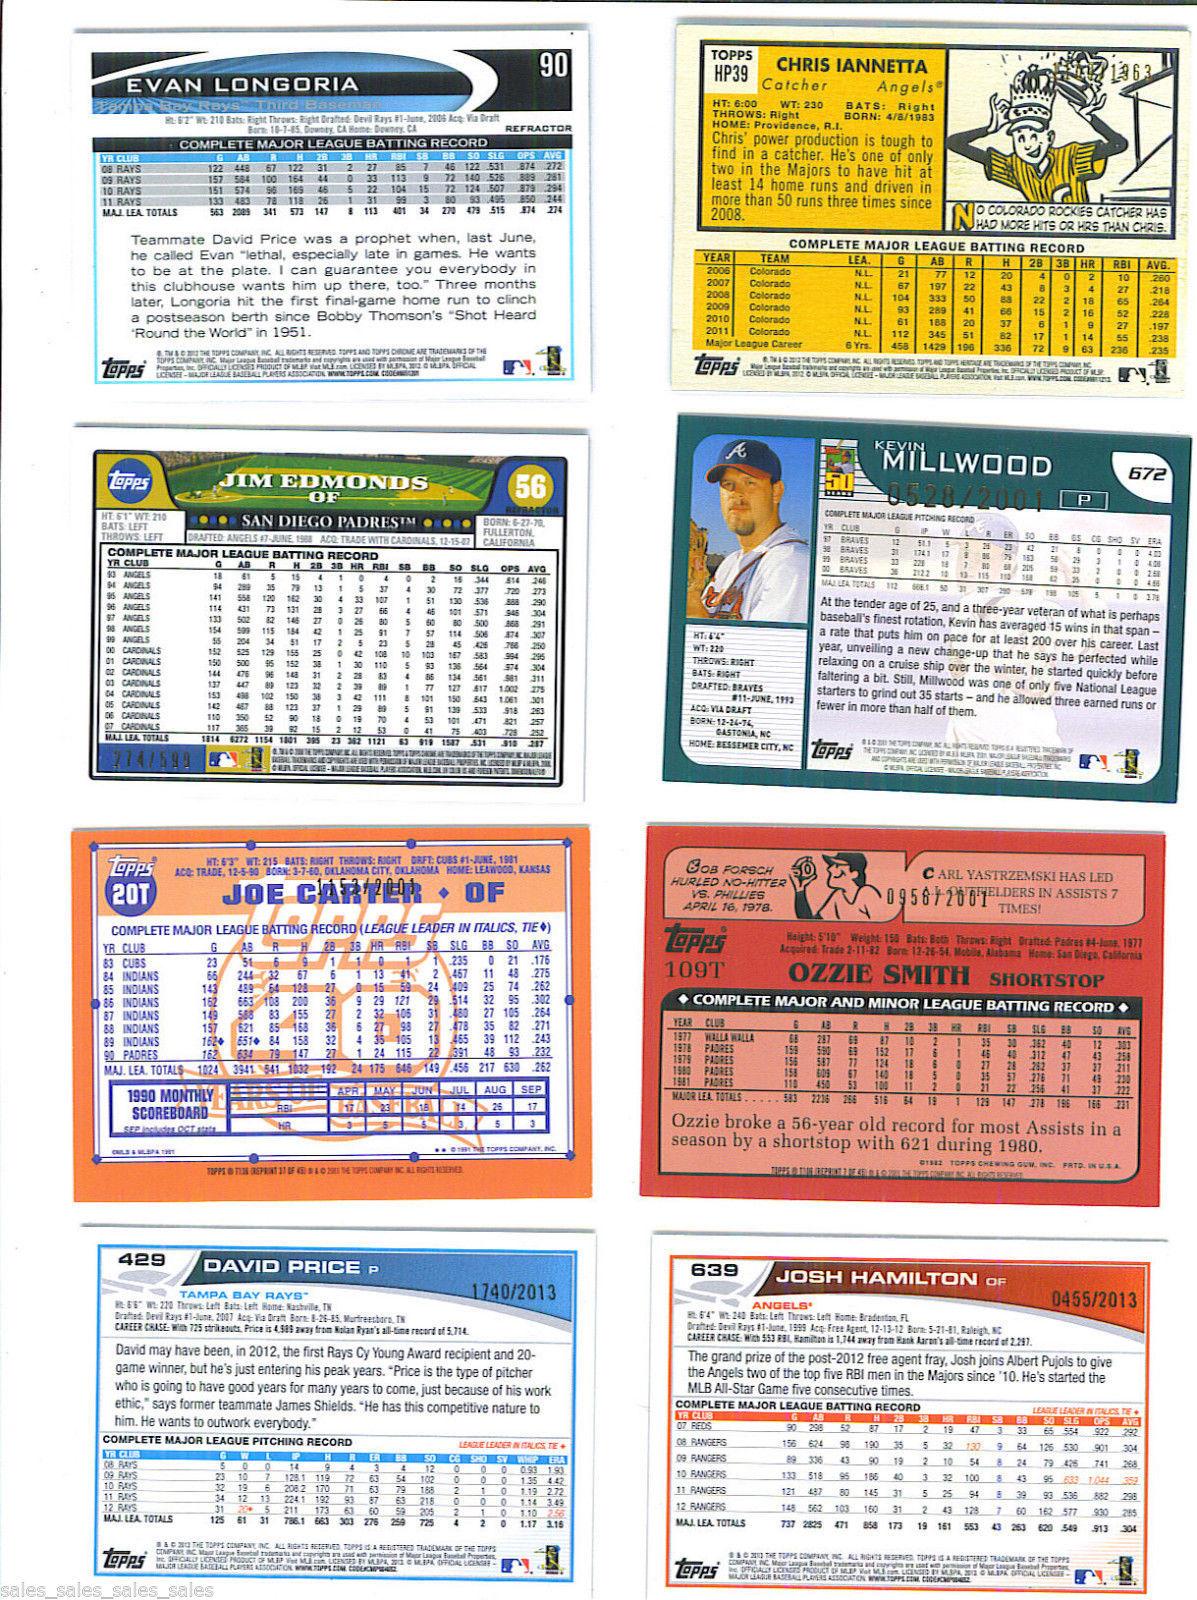 Jim EDMONDS 2008 Topps Chrome COPPER Parallel Card 56 274/599 PADRES